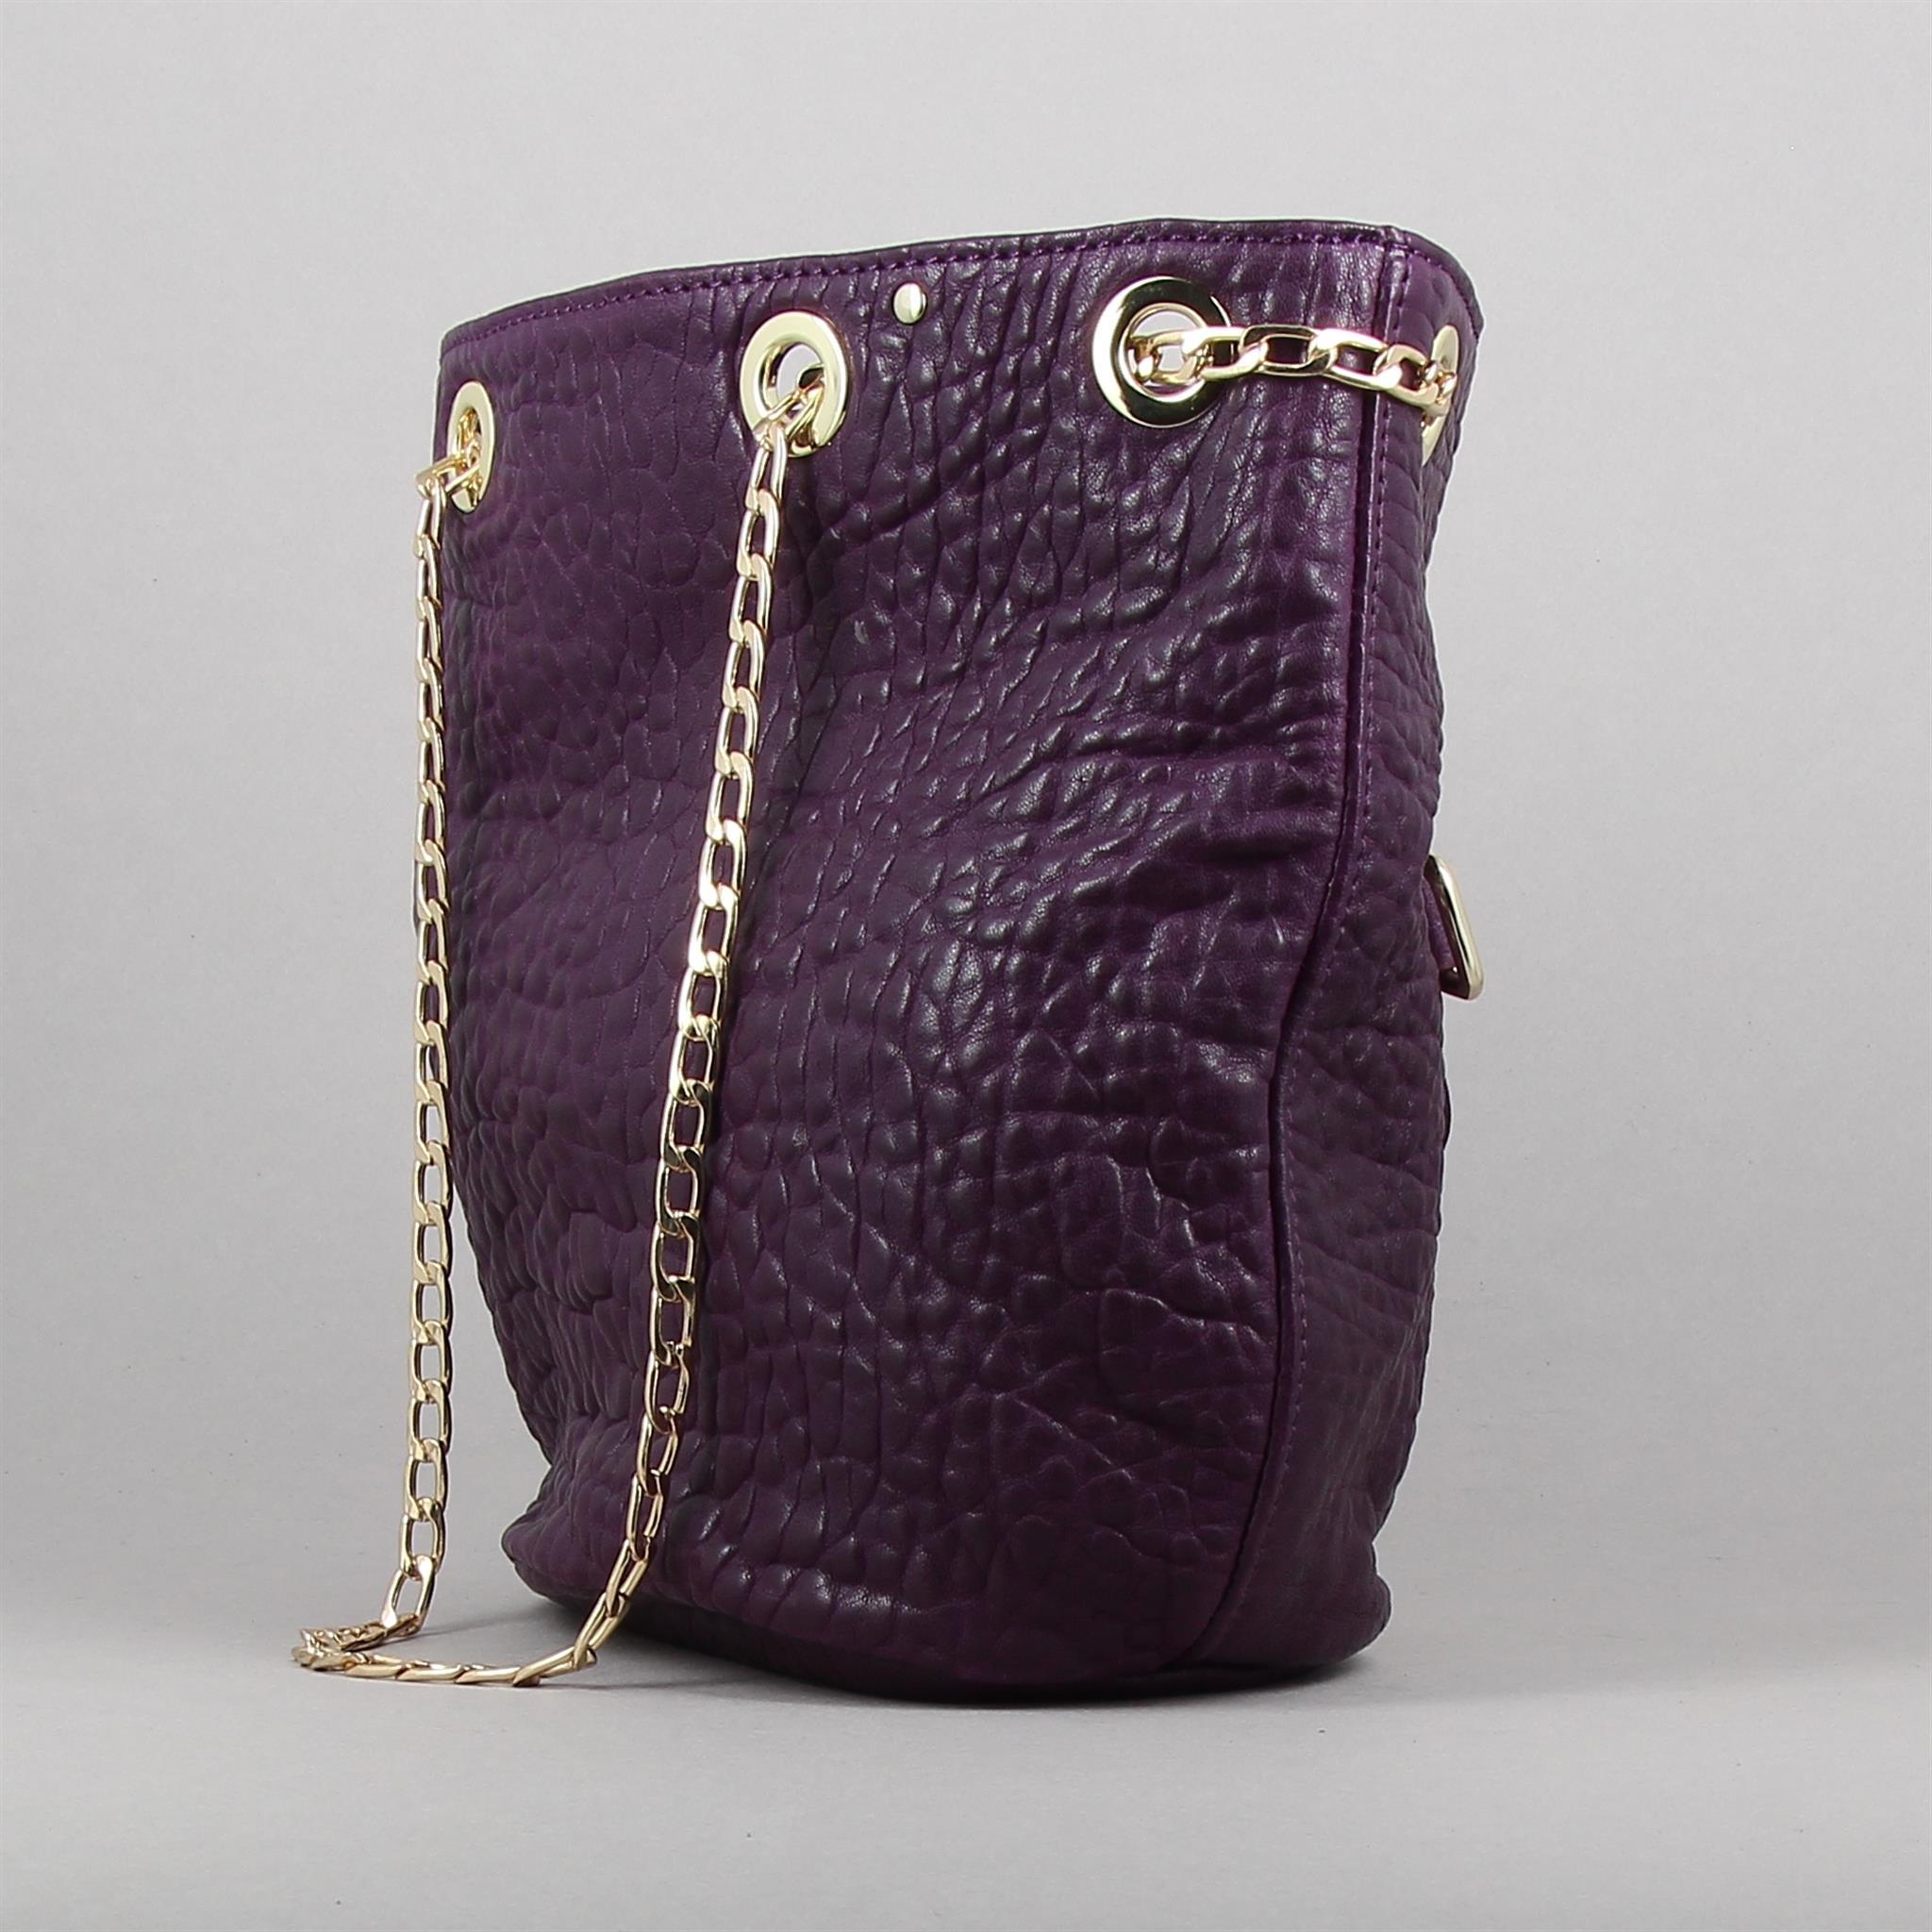 kacy-violet-278532-1.jpg